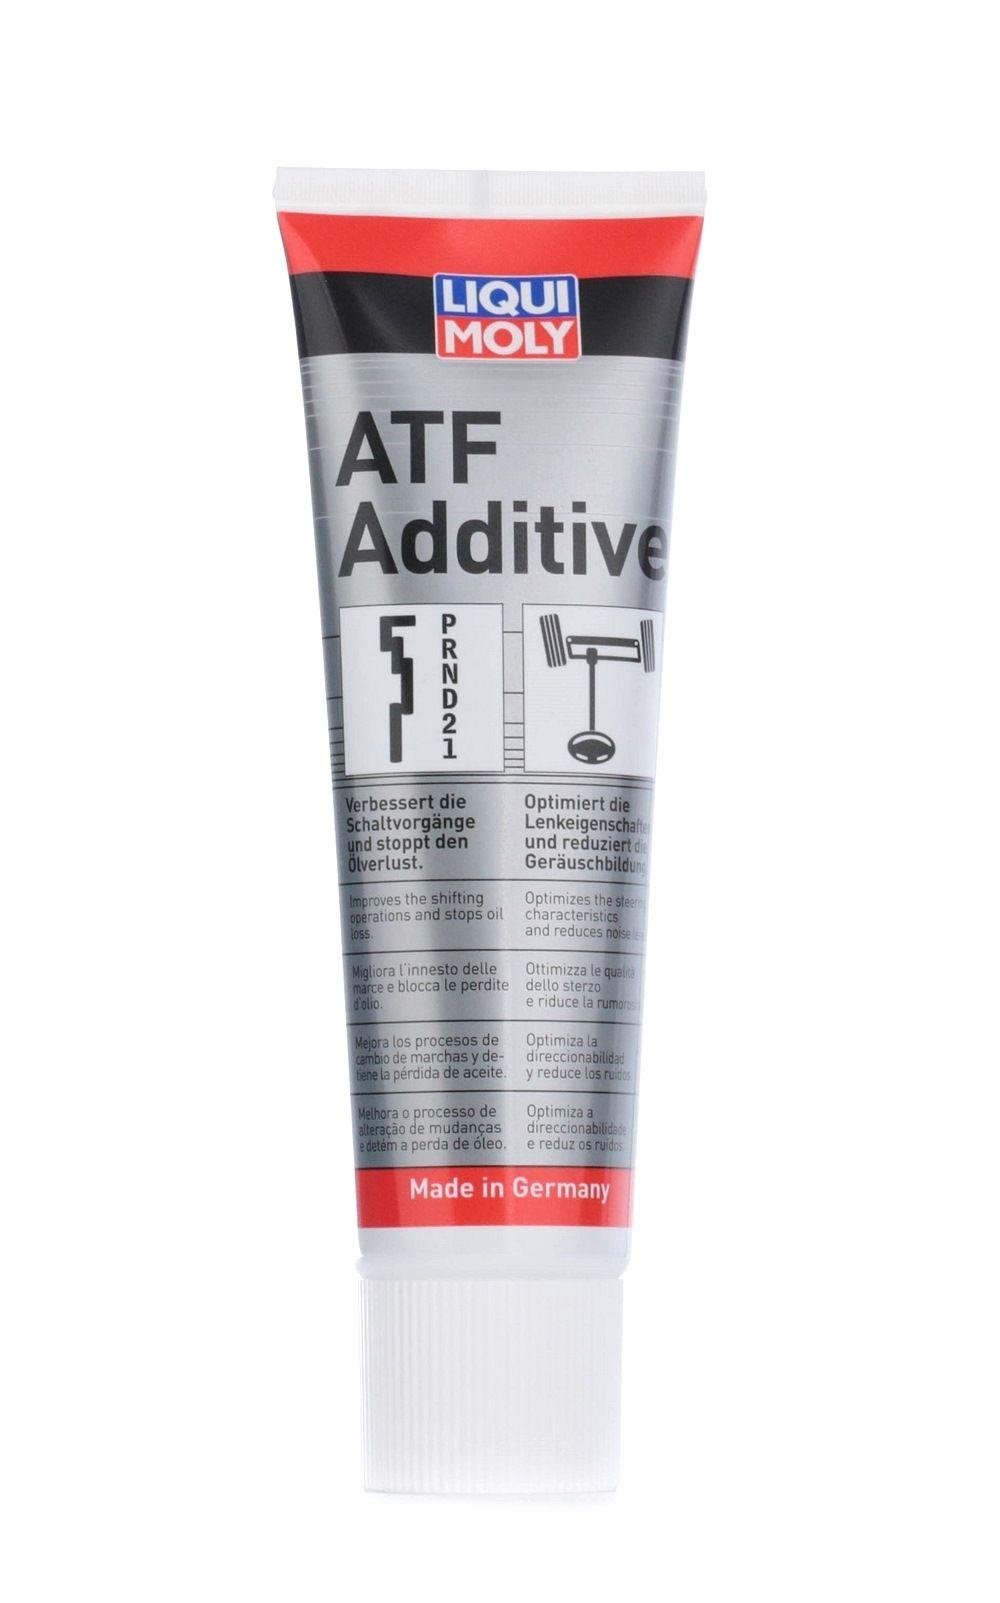 LIQUI MOLY Hydrauliköladditiv Tube, Inhalt: 250ml 5135 - kostengünstig kaufen